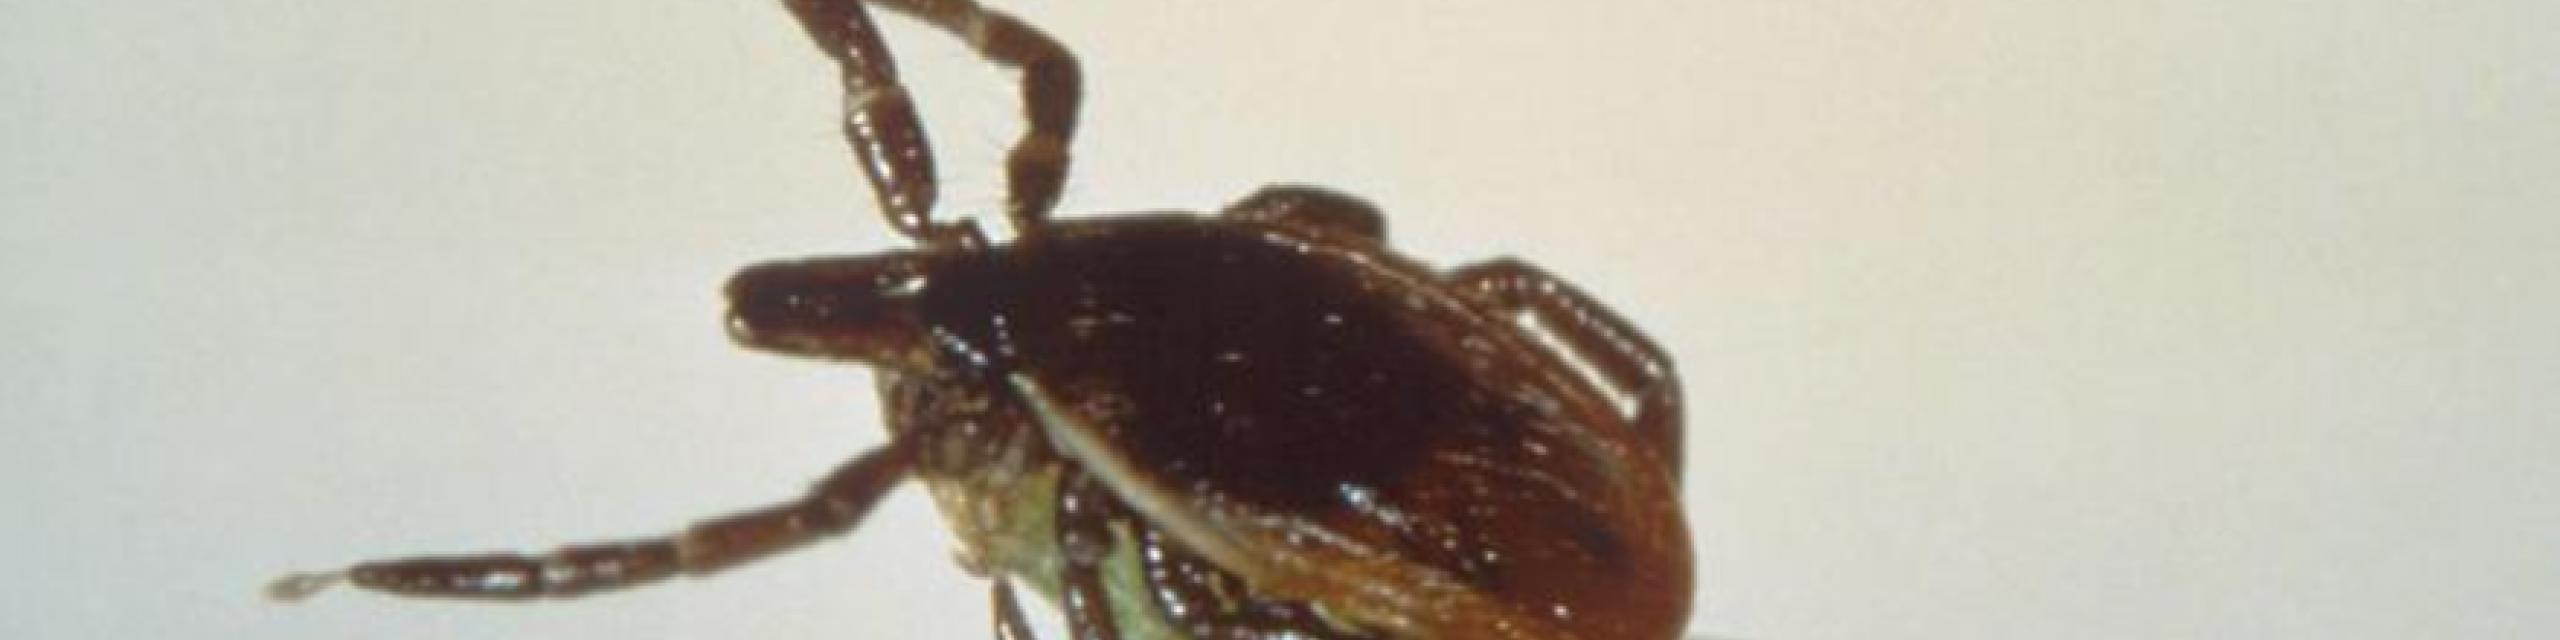 Example Image of Ticks - Humboldt Termite & Pest